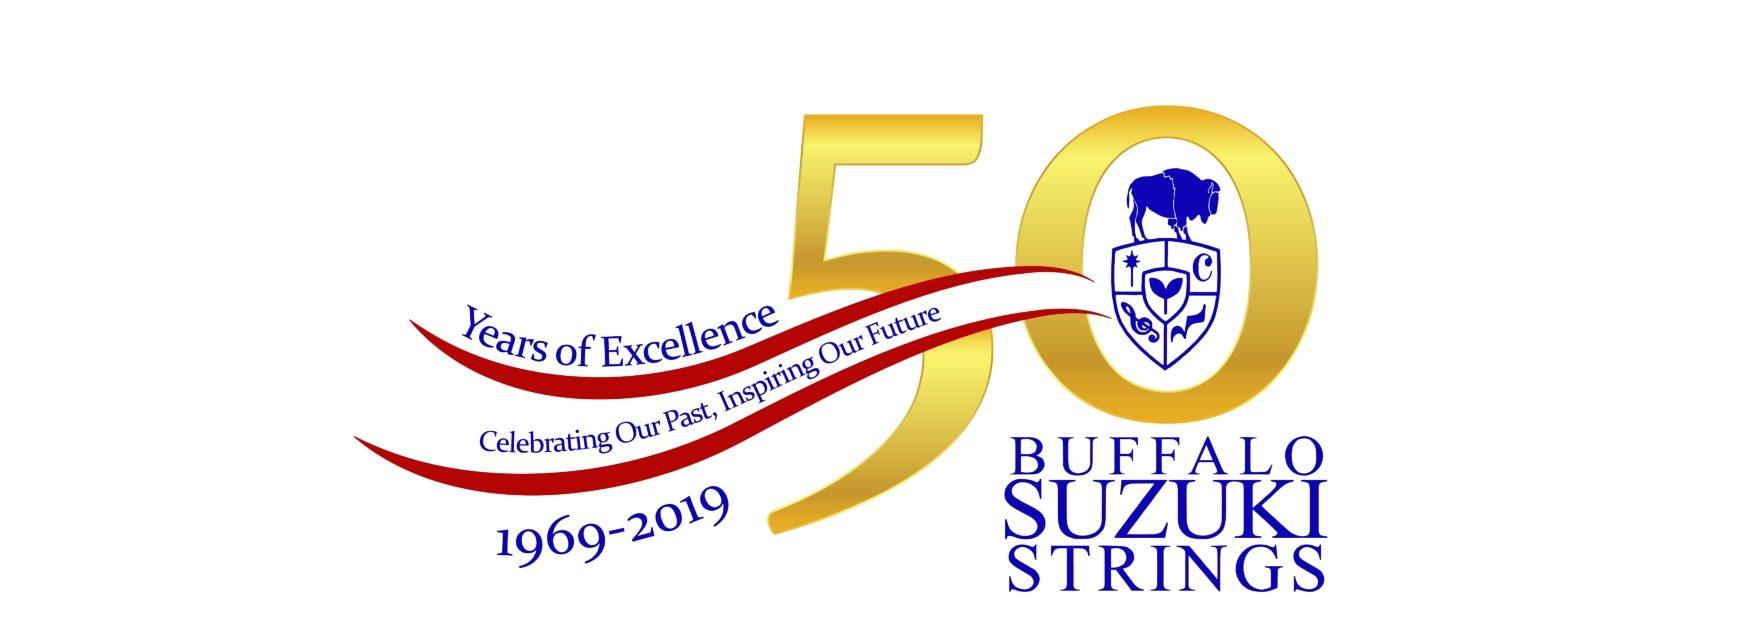 Welcome - Buffalo Suzuki Strings